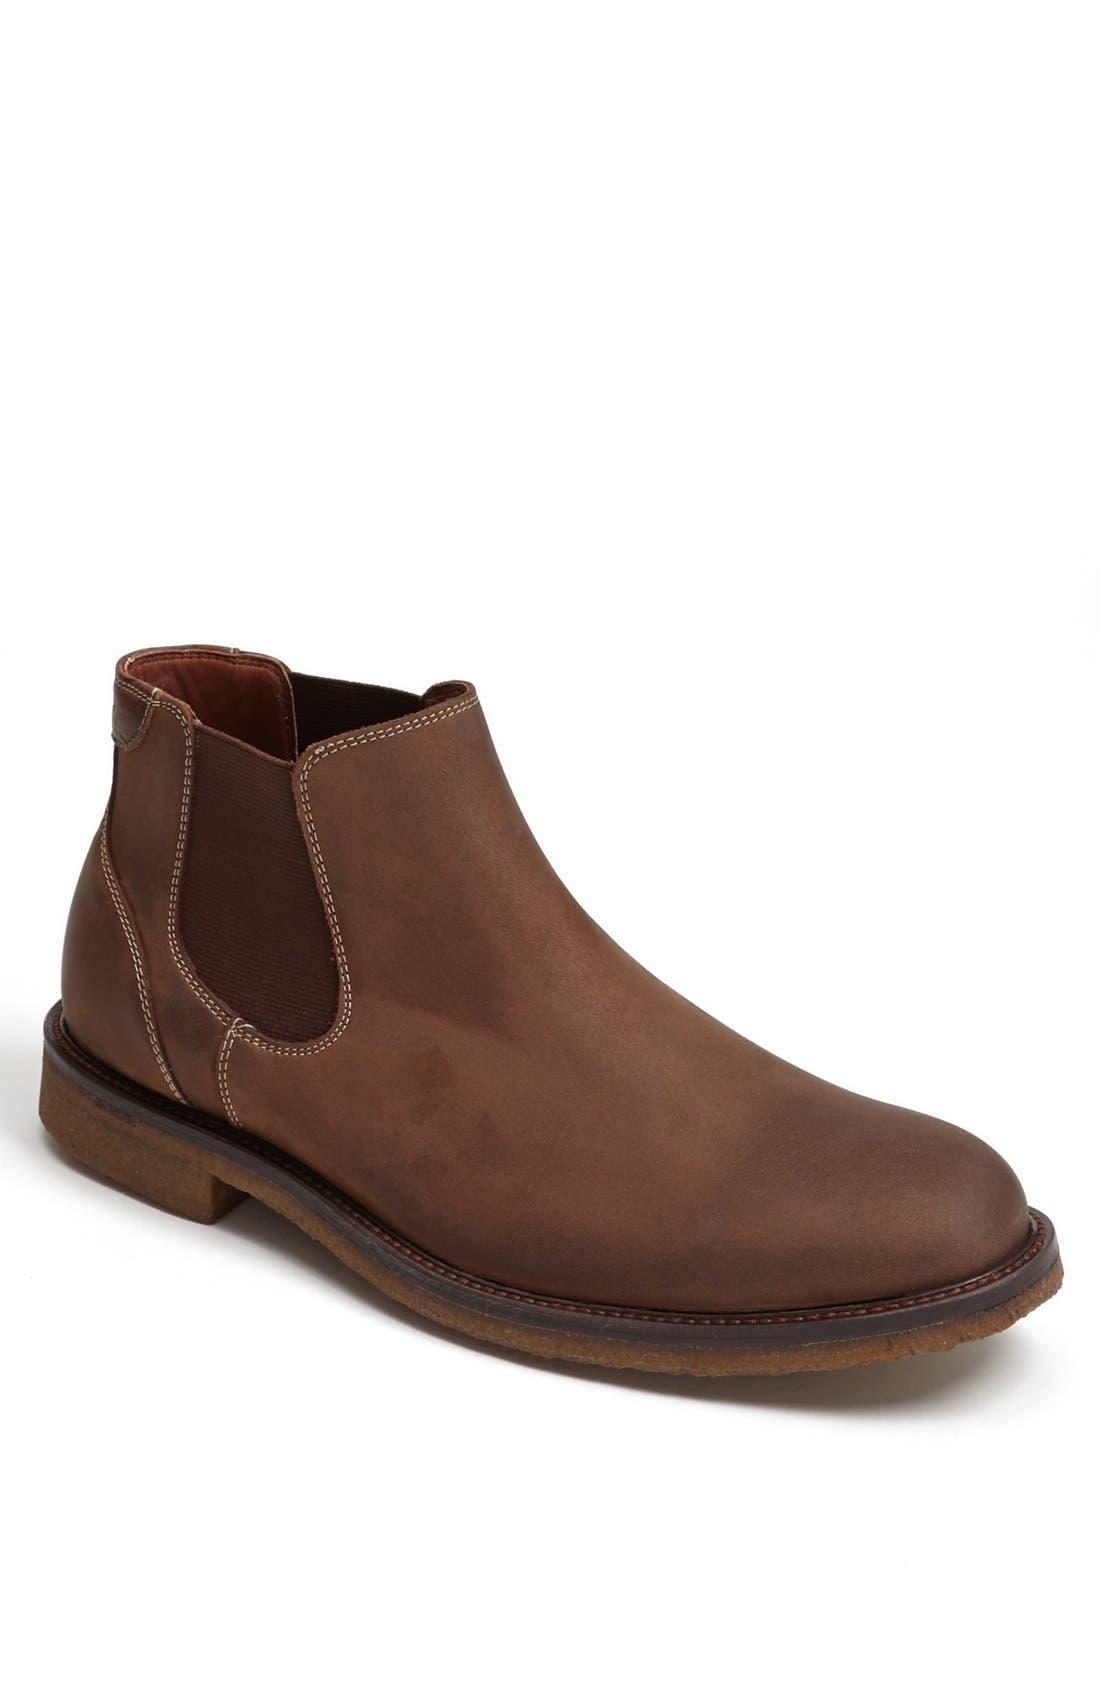 'Copeland' Chelsea Boot, Main, color, 240